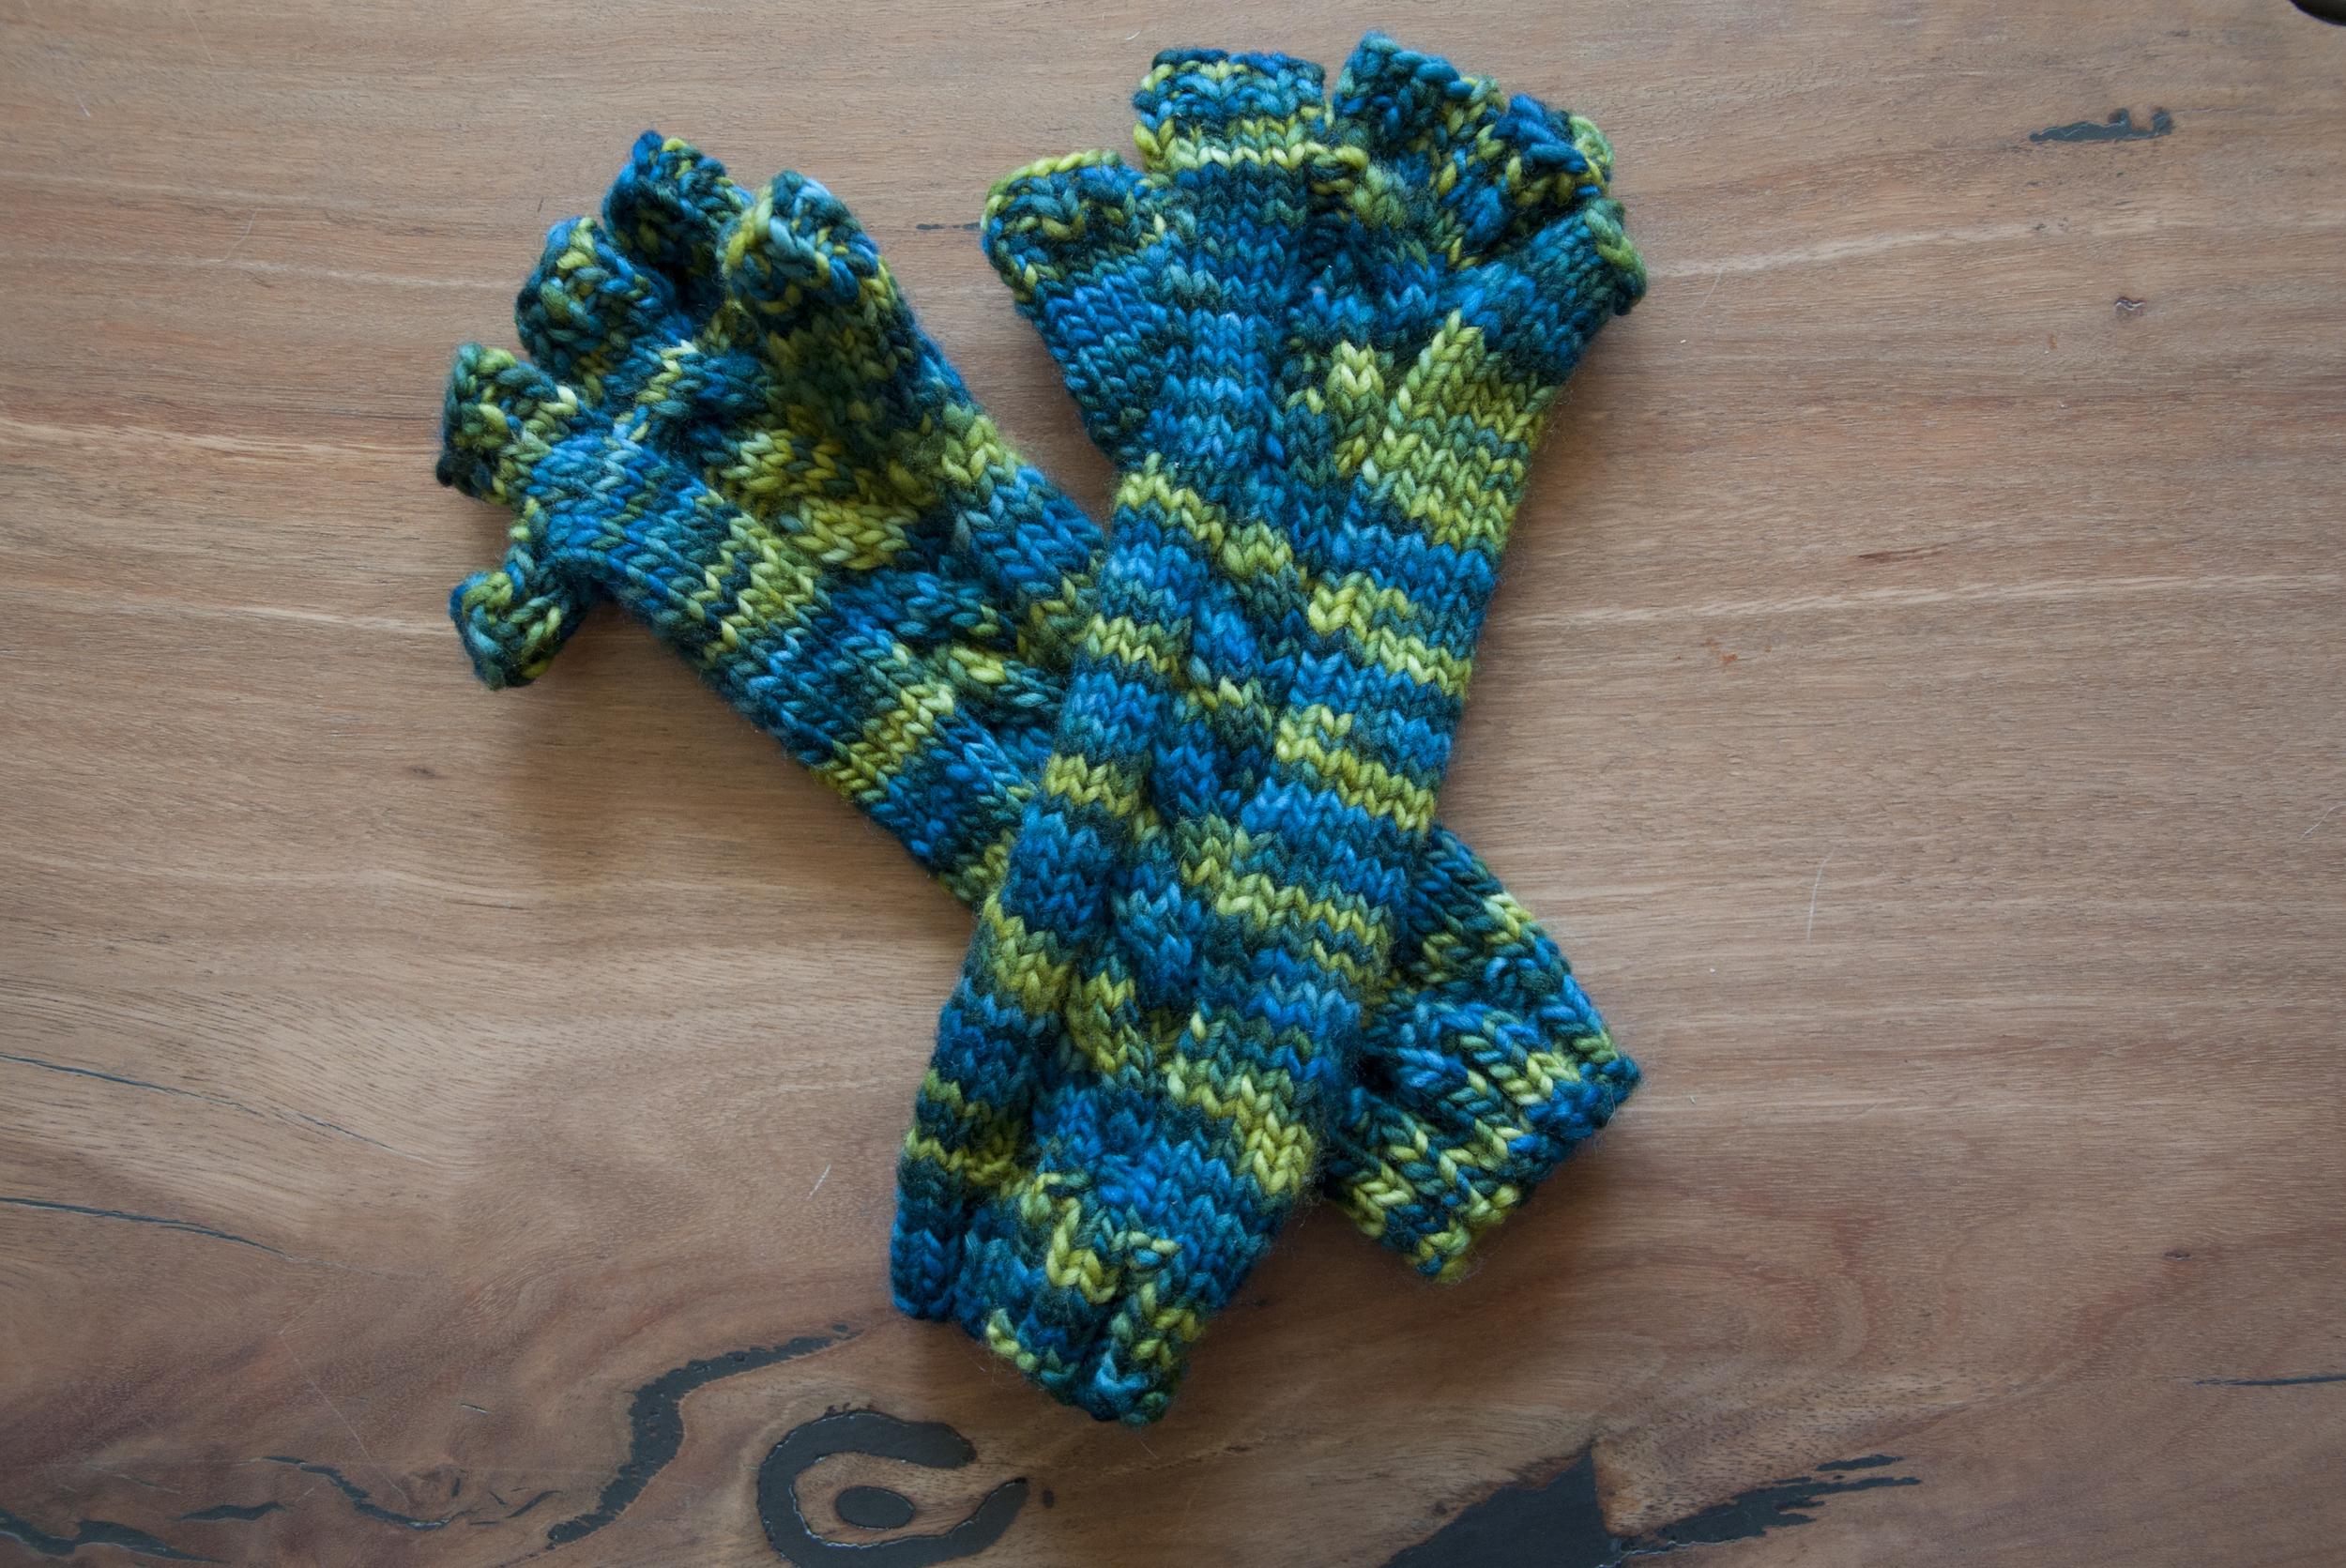 Crafts_Ashlyn Gloves_20131013_0007.jpg